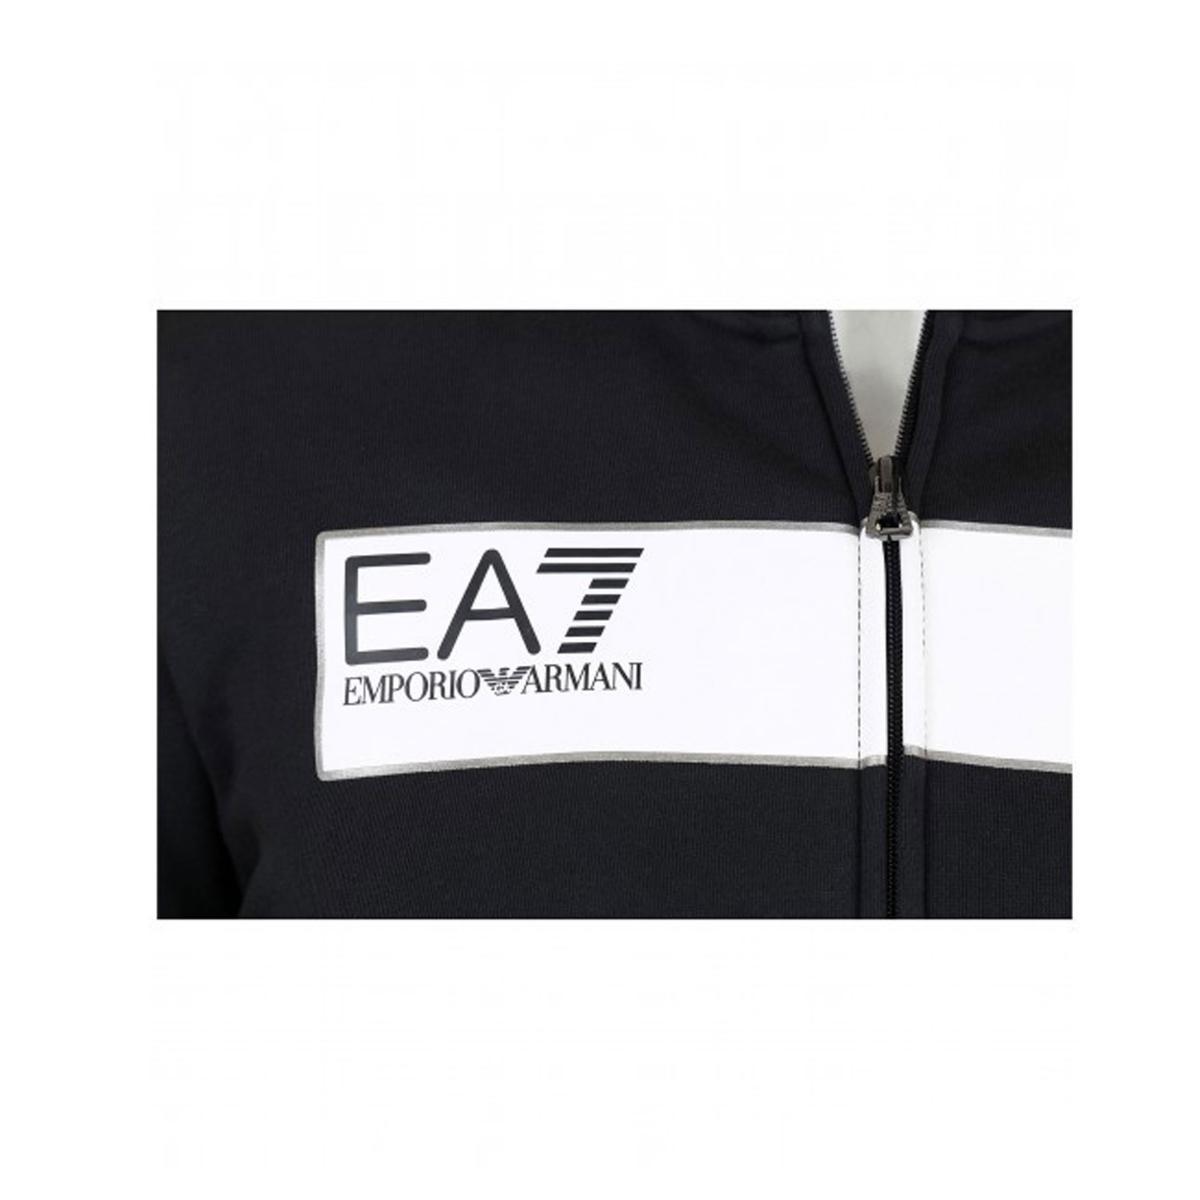 Felpa con logo Emporio Armani EA7 da uomo rif.6ZPM48 PJ07Z